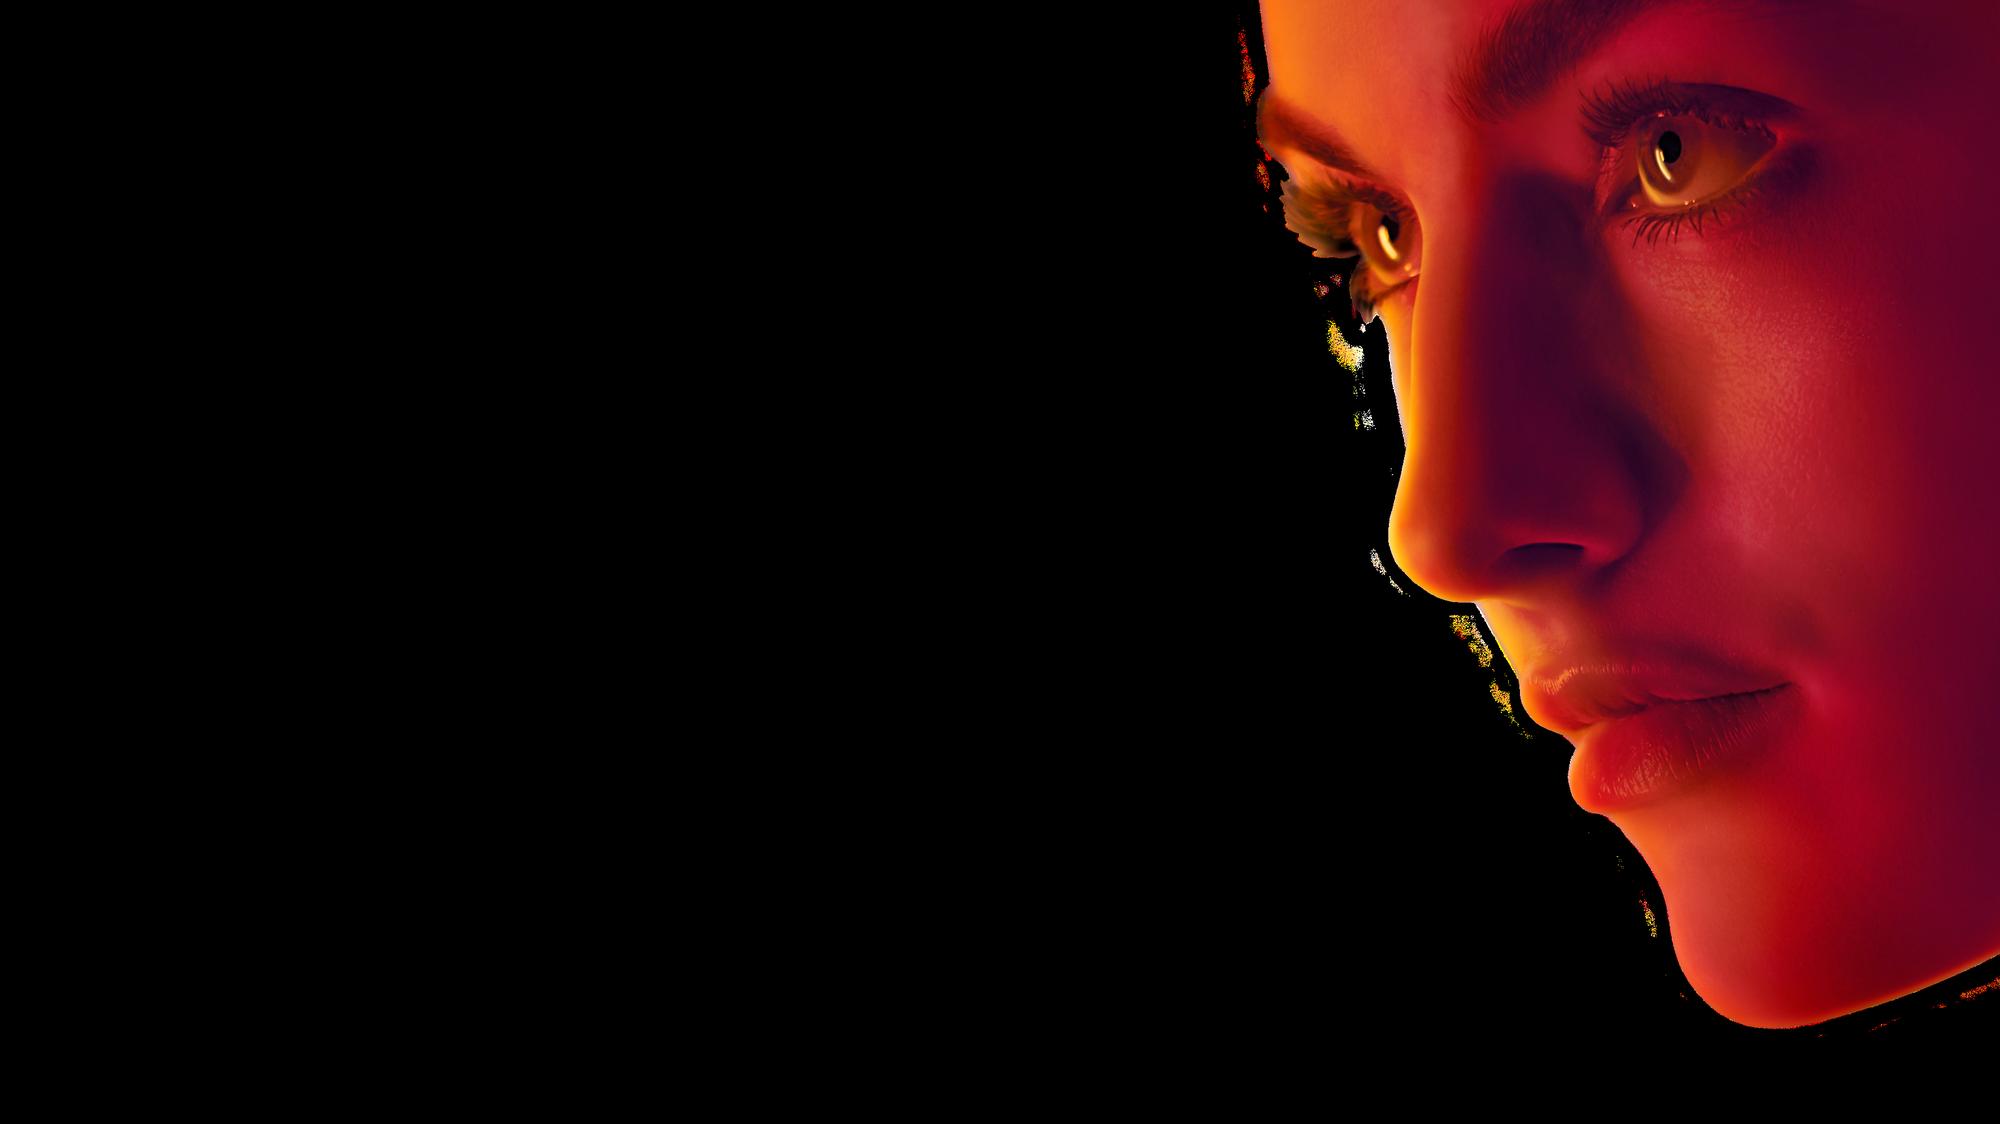 Gesicht © Fotograf Max Mustermann, AK